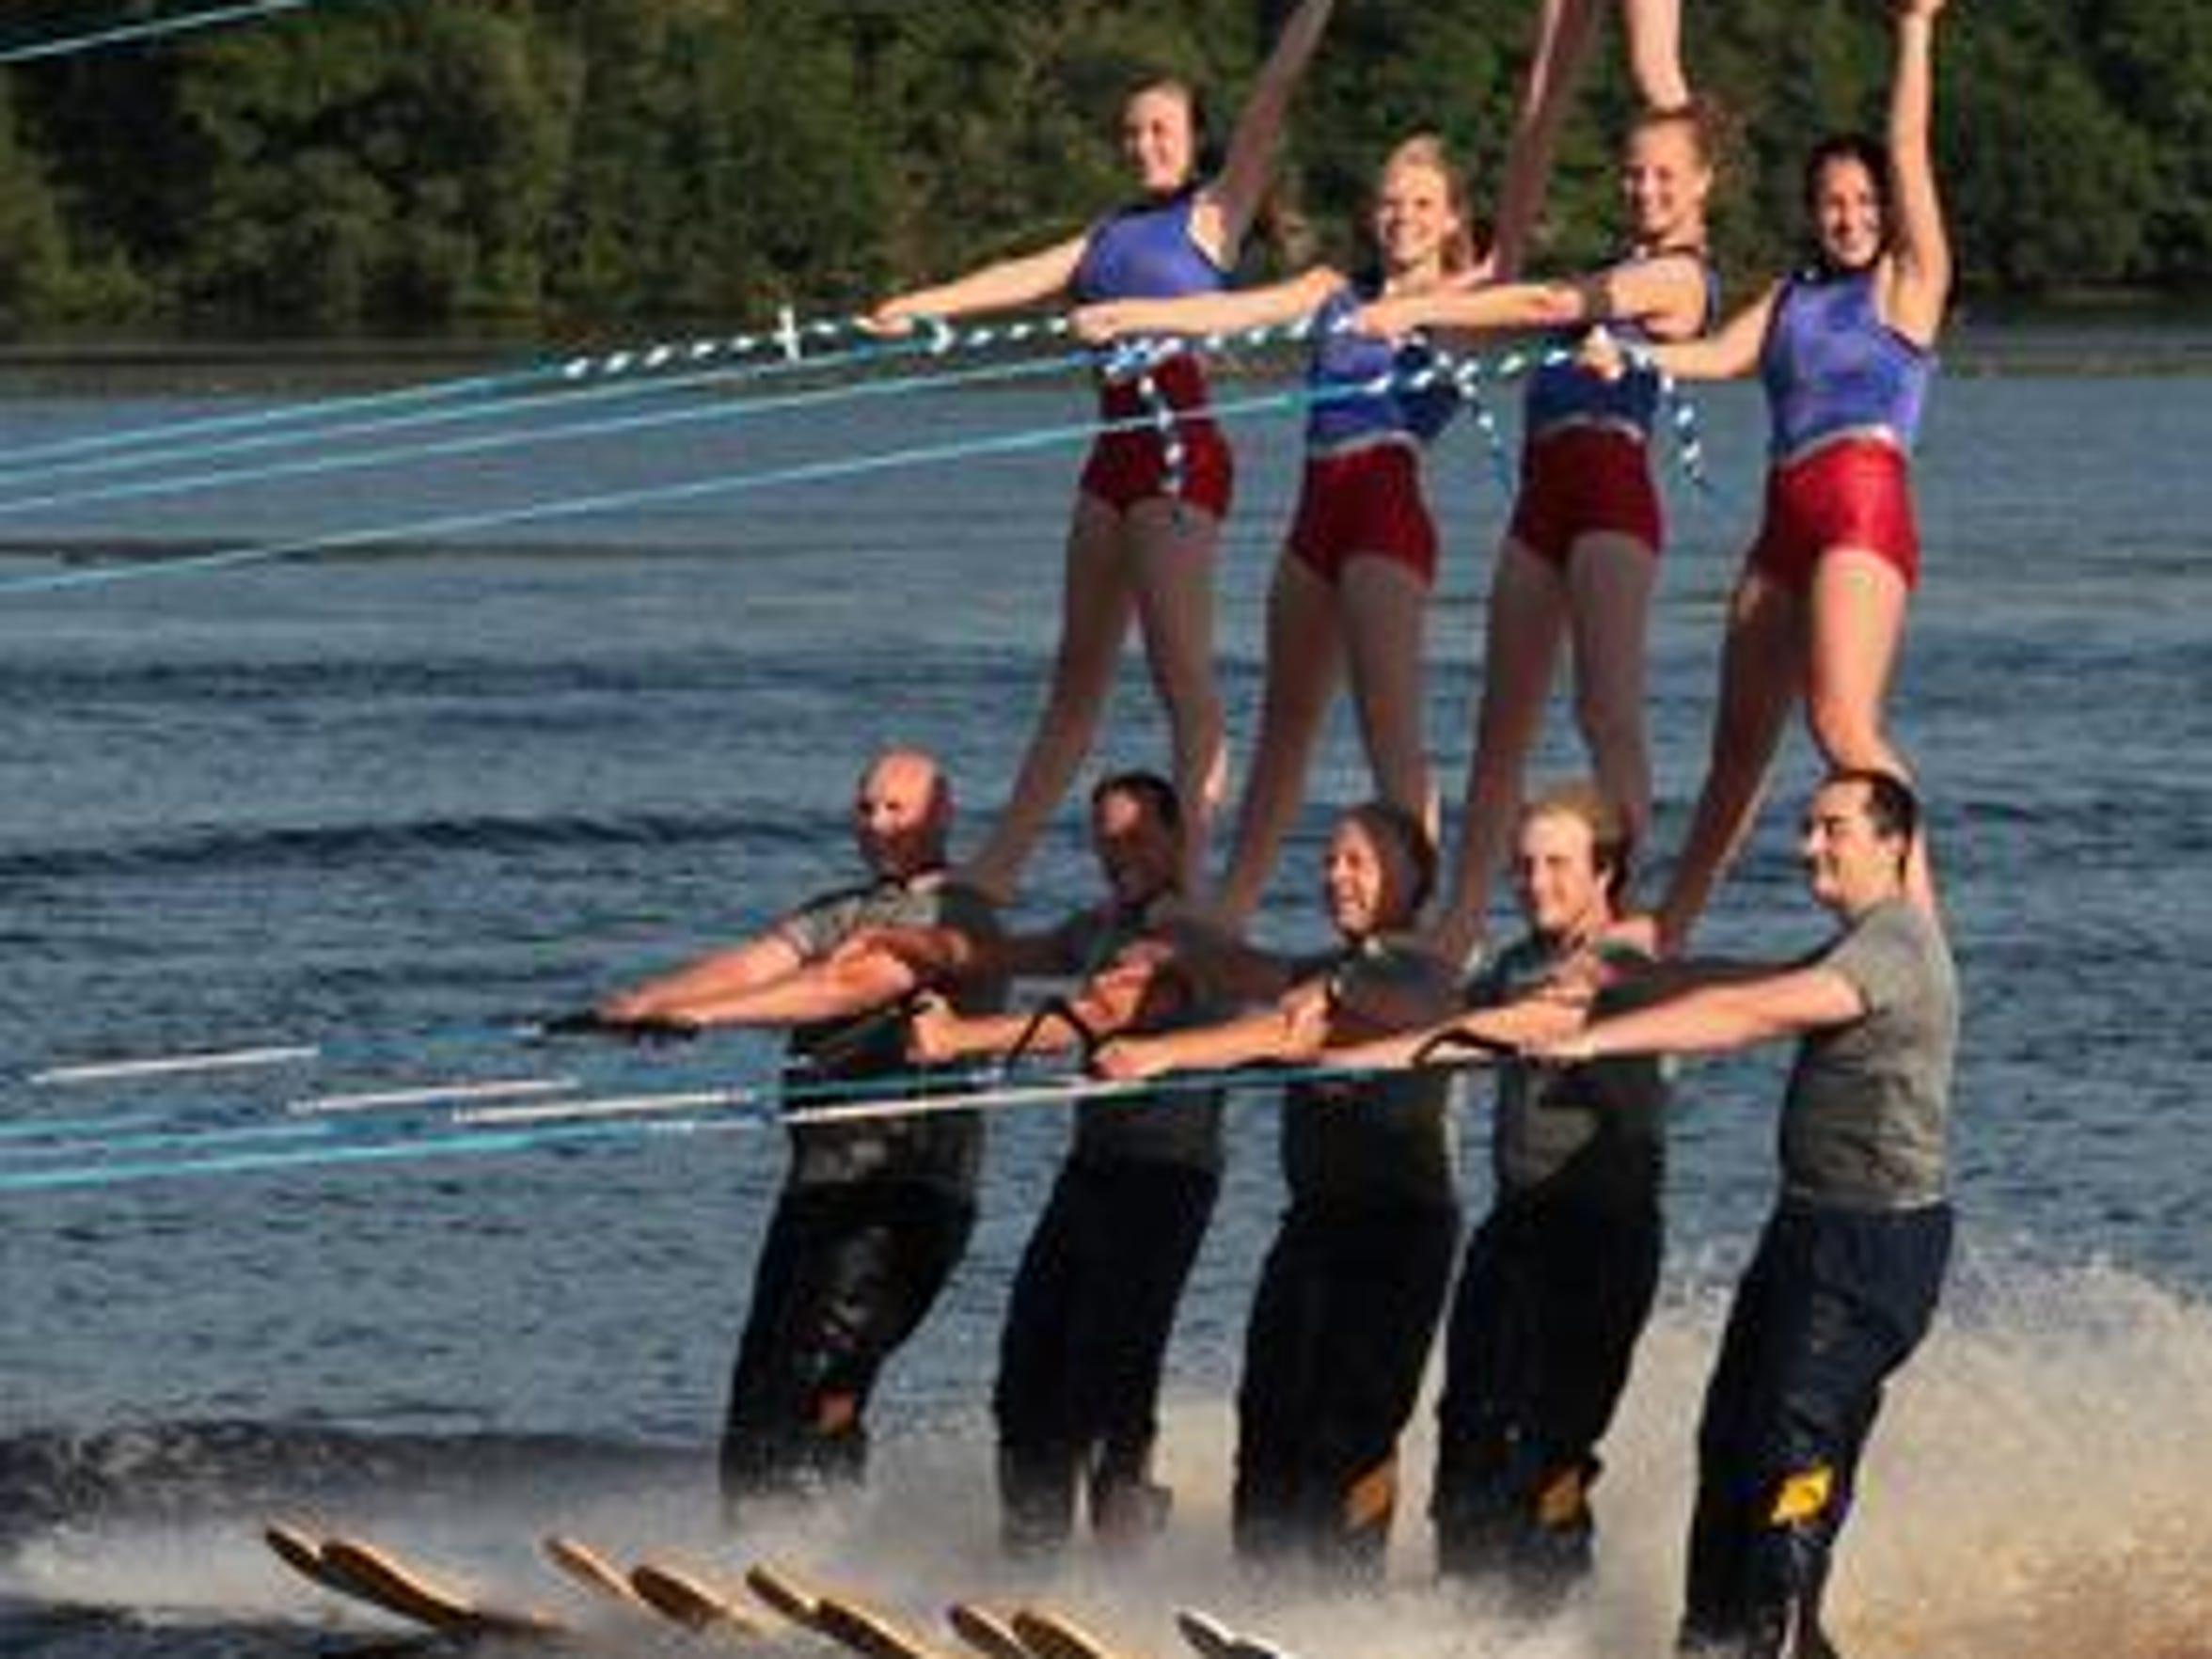 The Water Walkers Water Ski Show Team performs in 2013 on Lake Wausau.